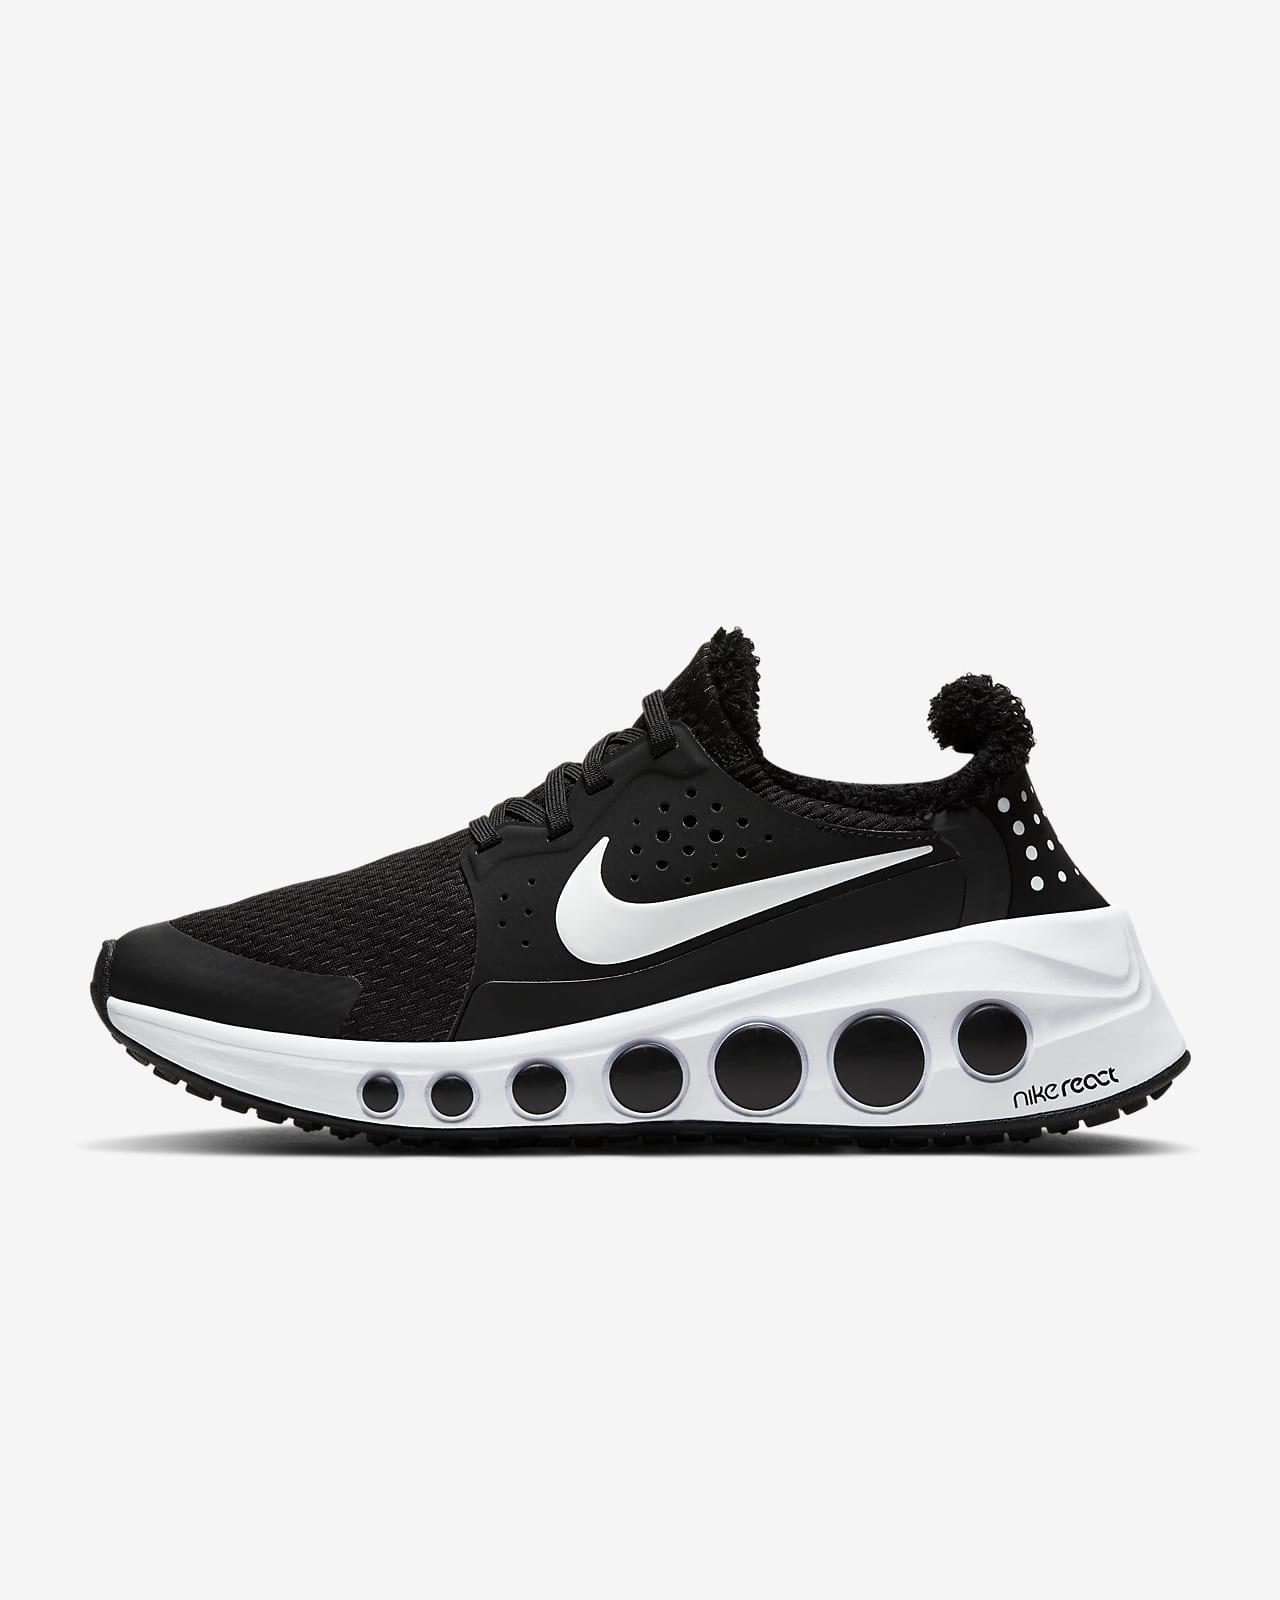 Nike CruzrOne Unisex Shoe